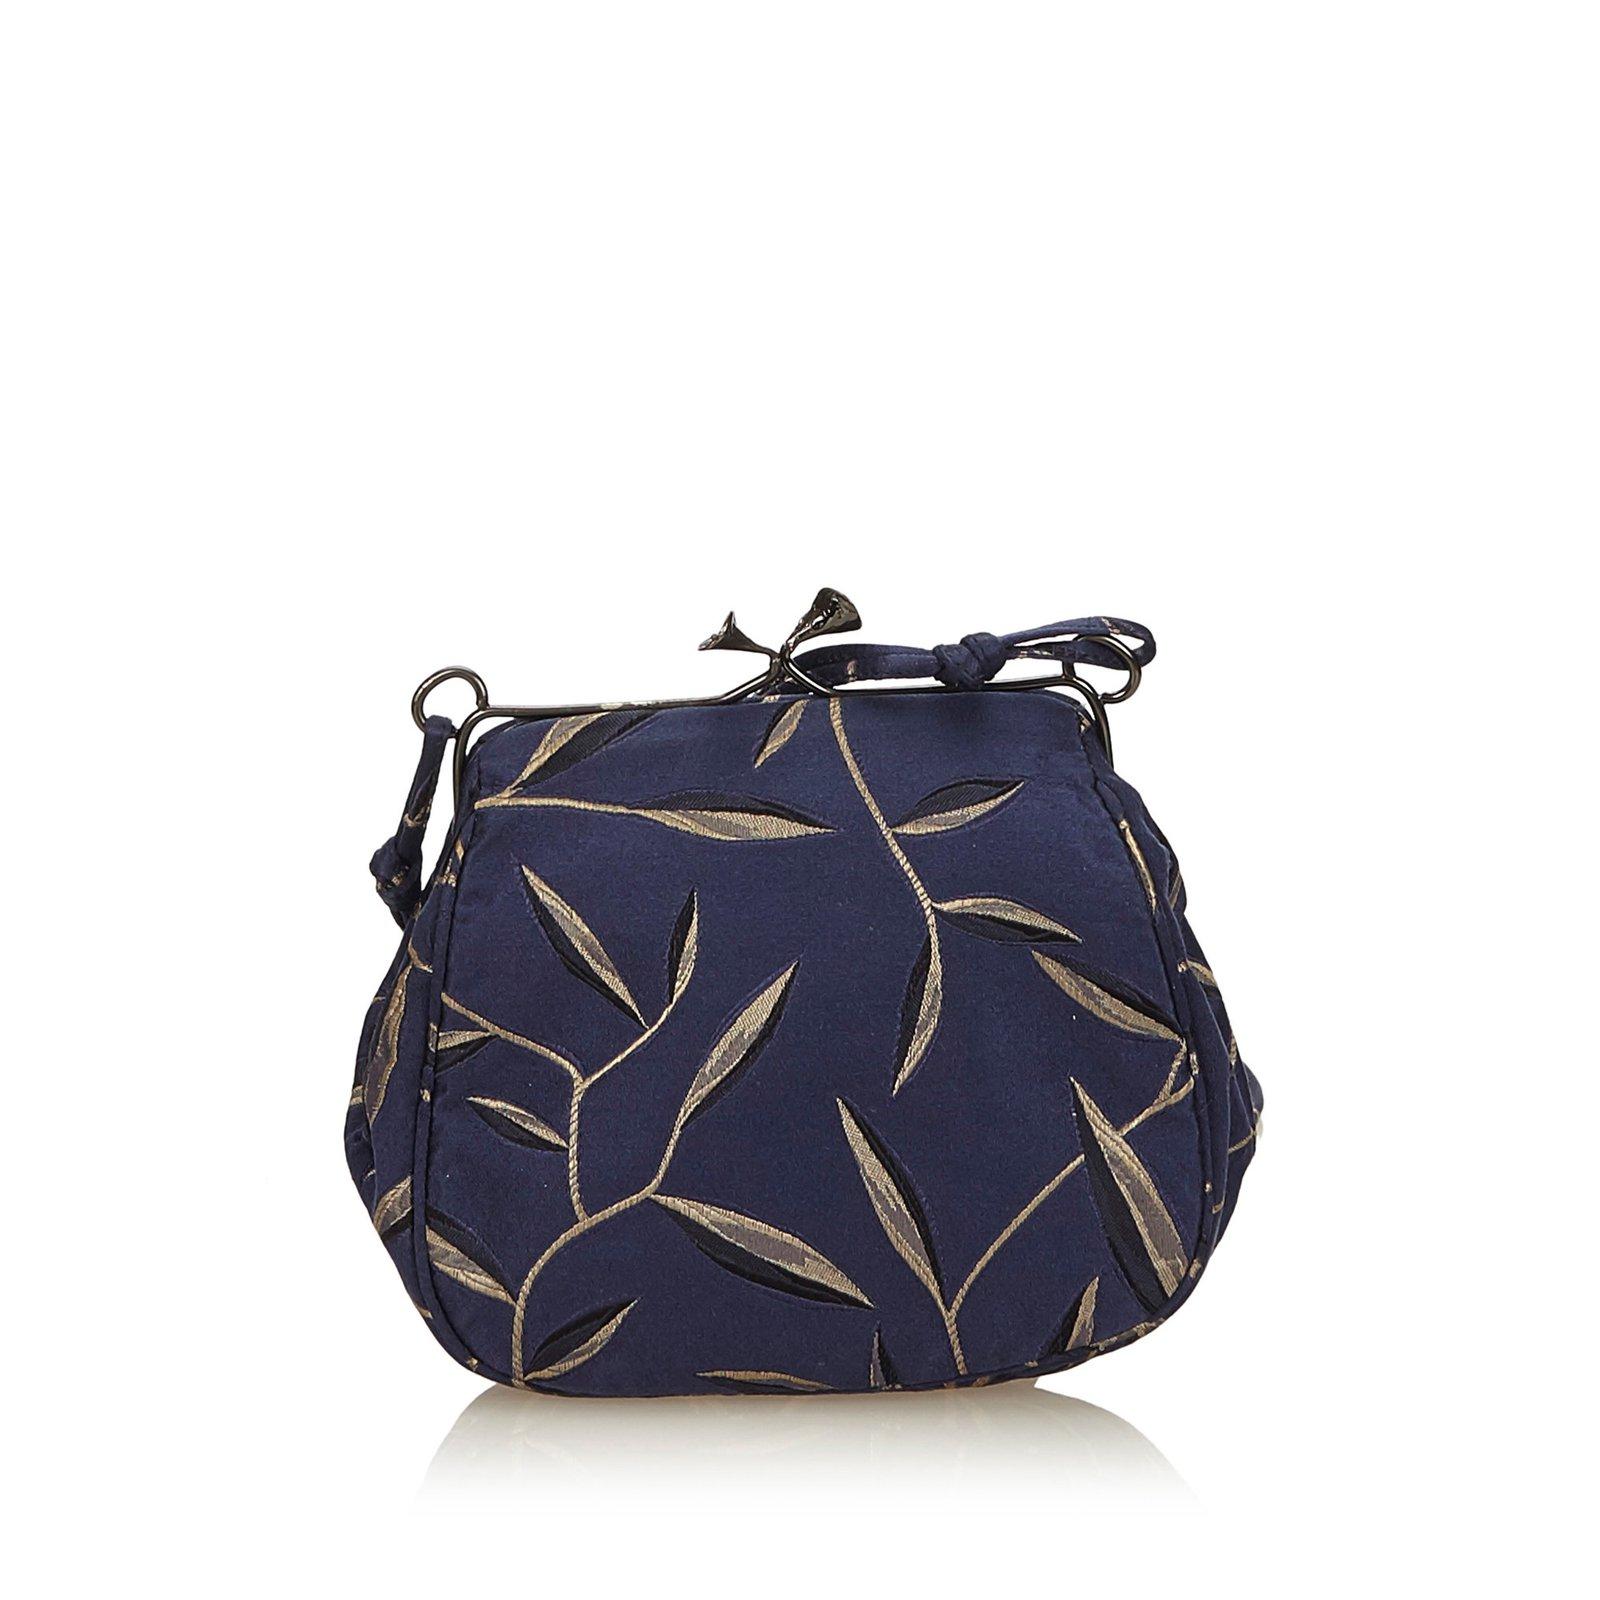 dba9a4f9f6 Prada Printed Chemical Fiber Crossbody Bag Handbags Other,Cloth ...